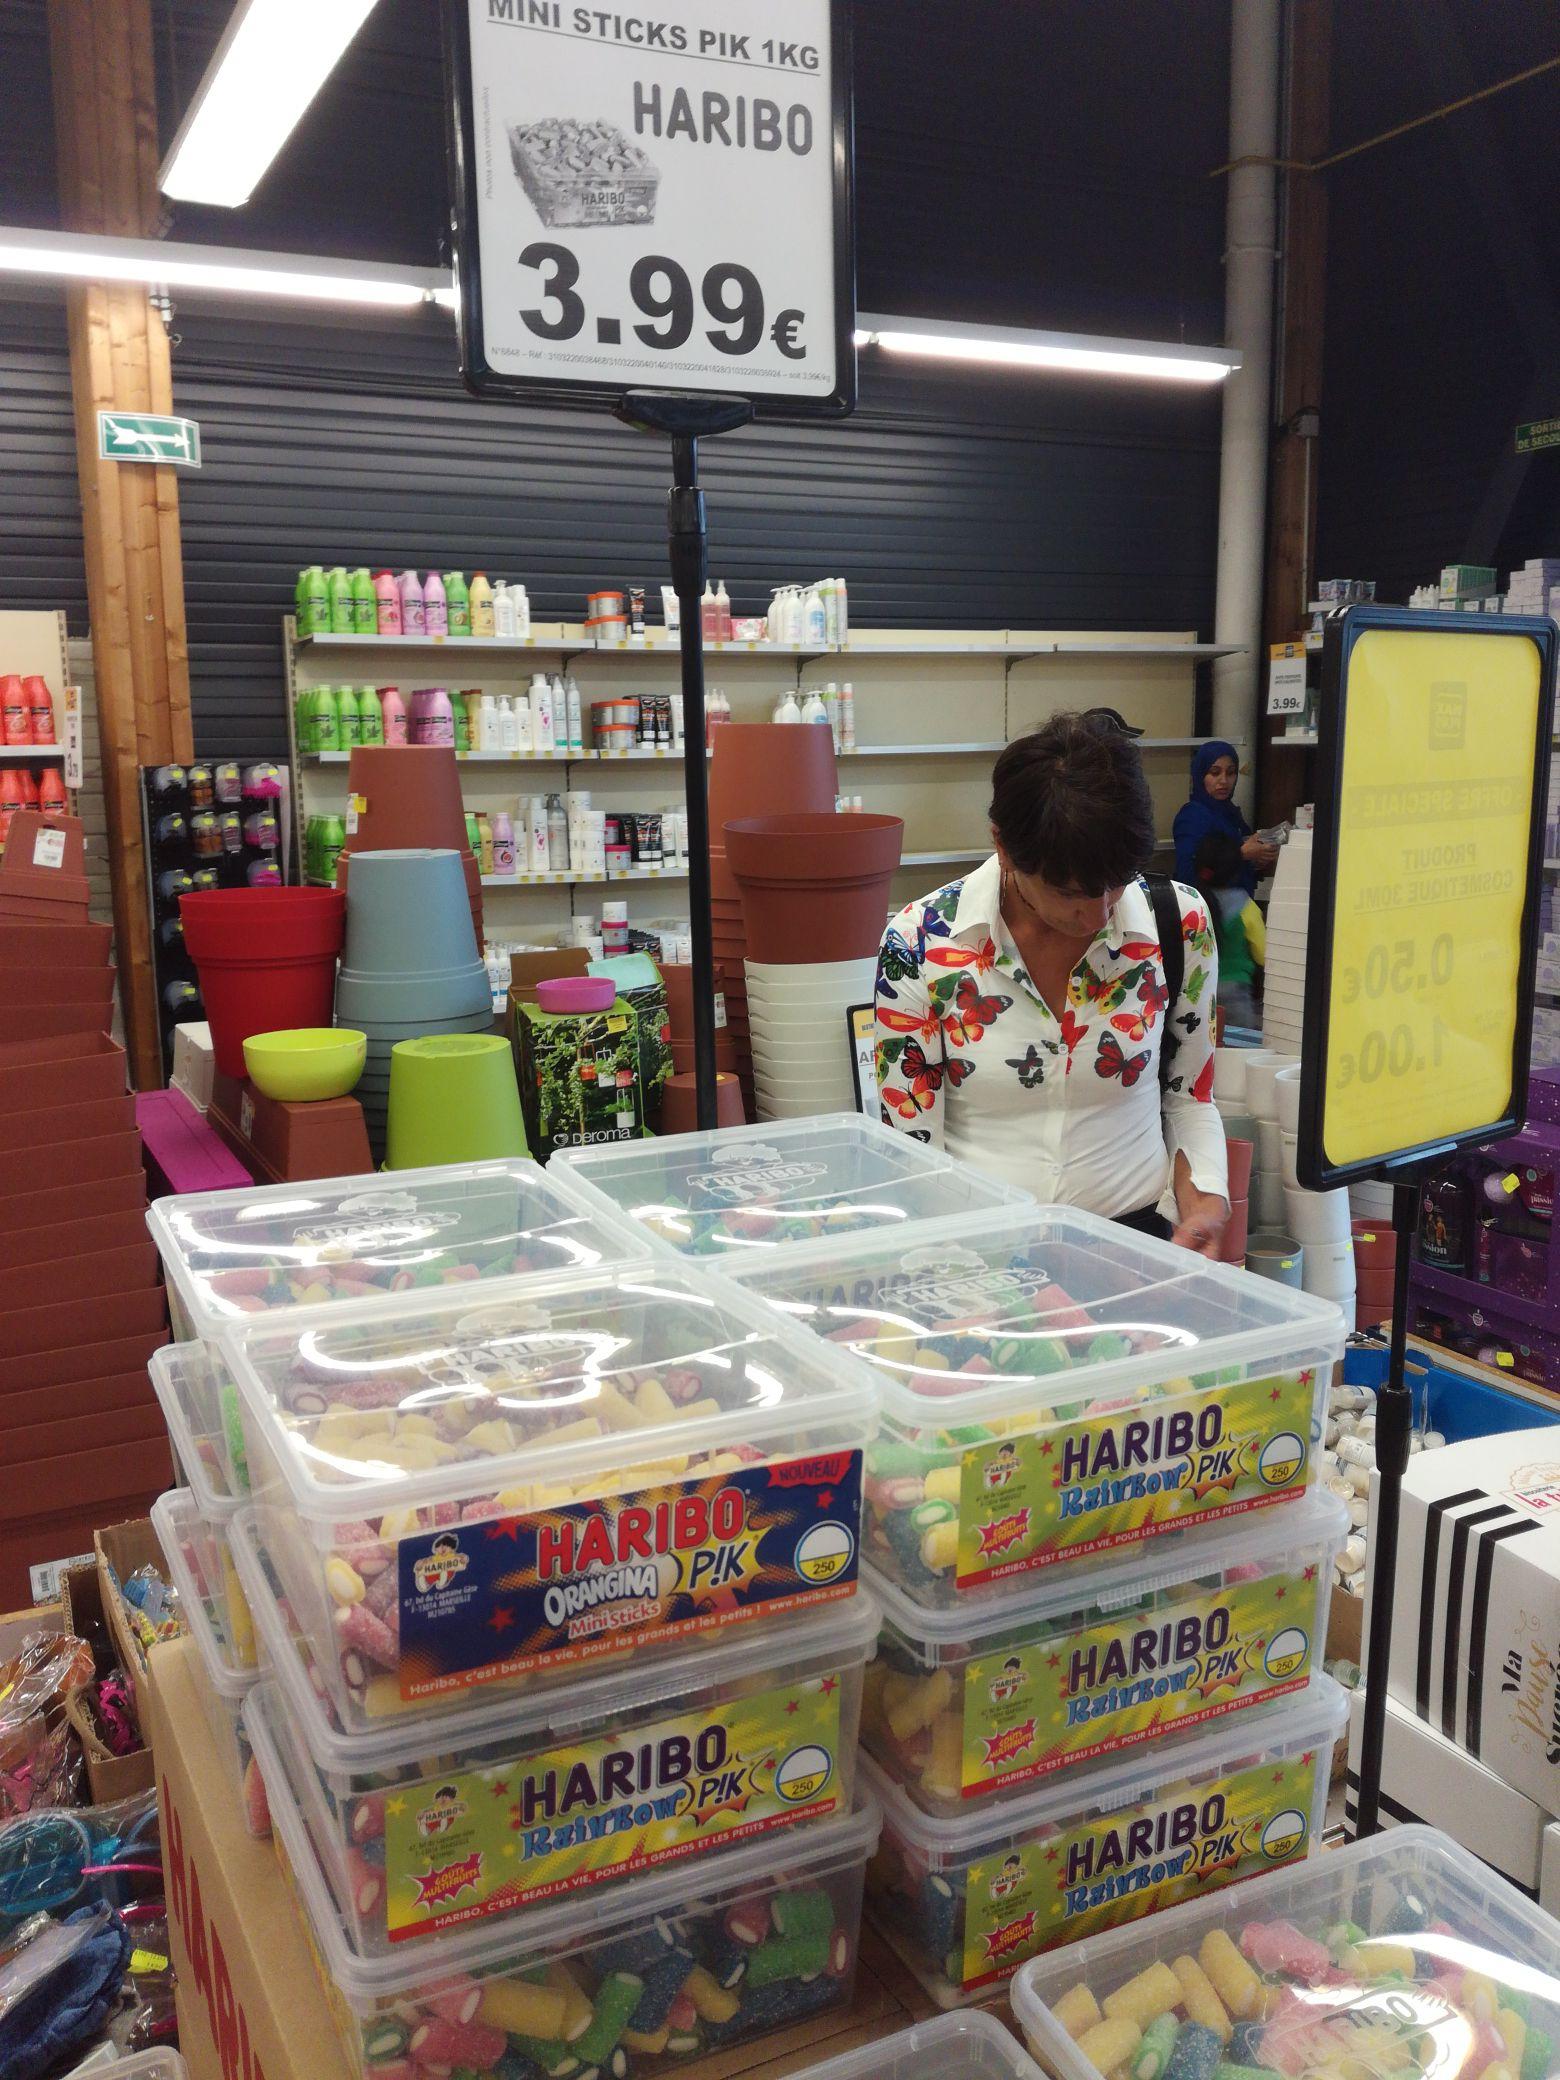 Boîte de bonbons Haribo Sticks Pik (1Kg) - Chantepie (35)